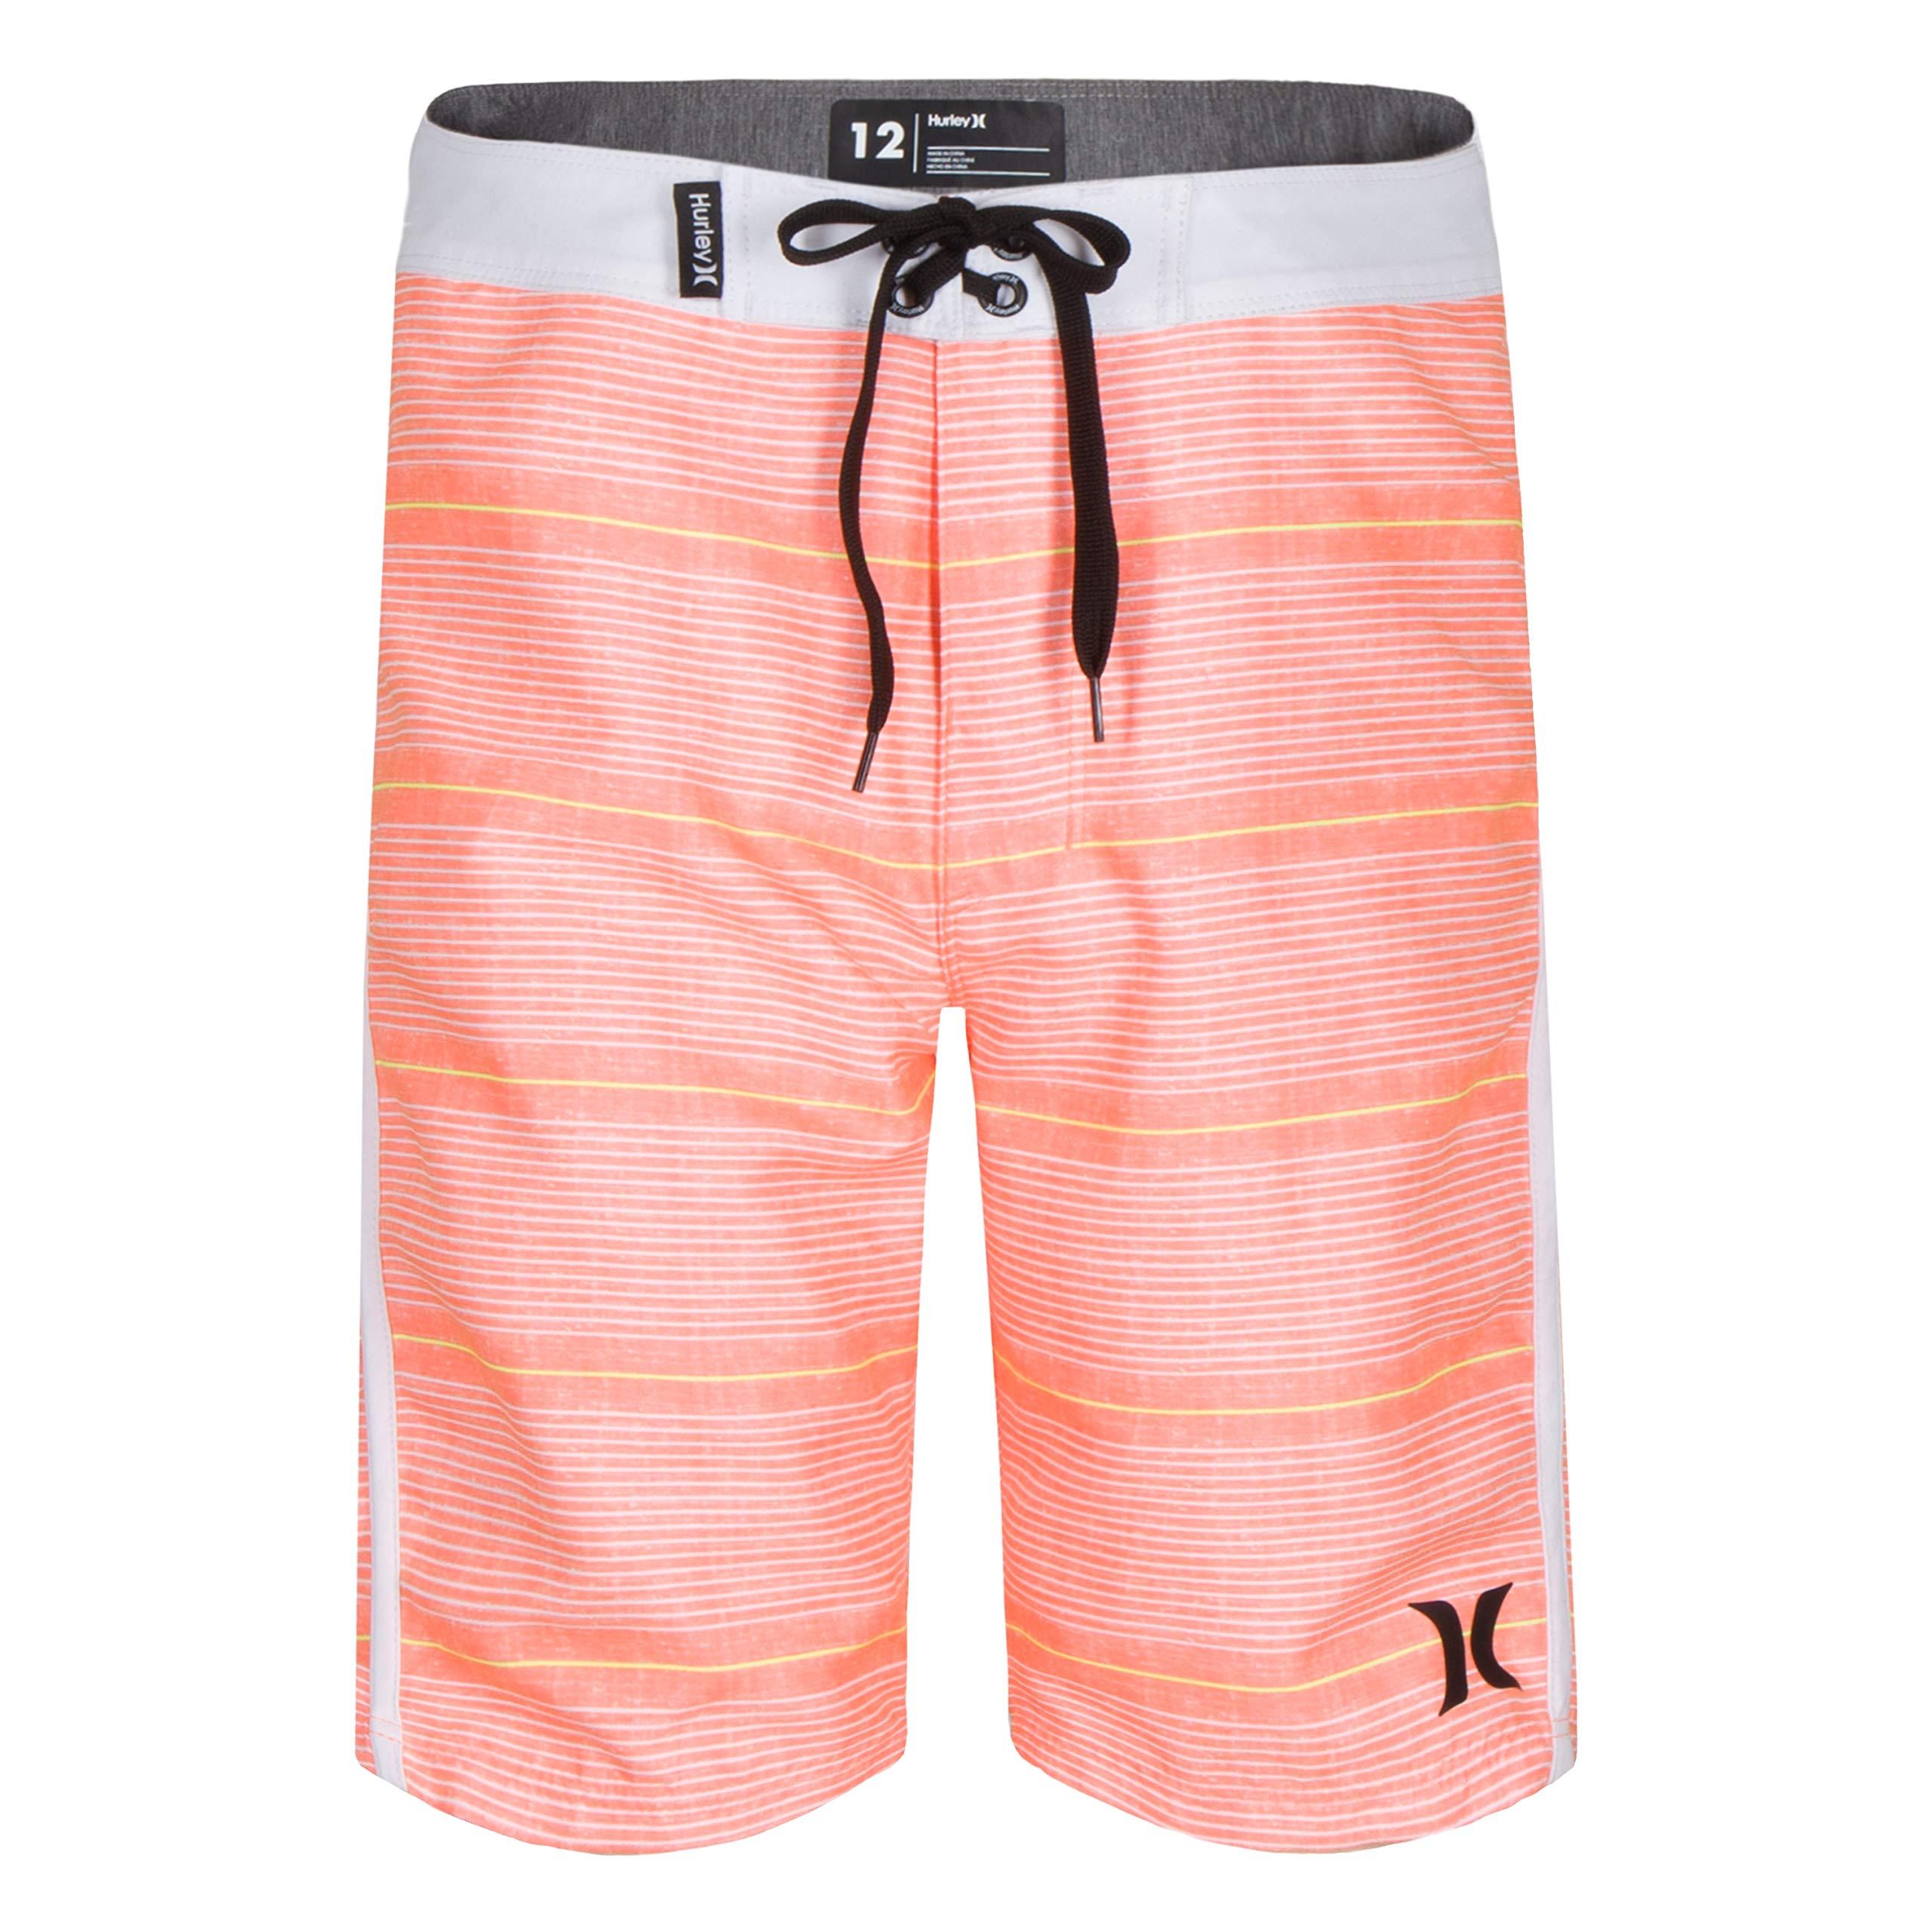 Hurley Big Boys' Board Shorts, Bright Mango, 16